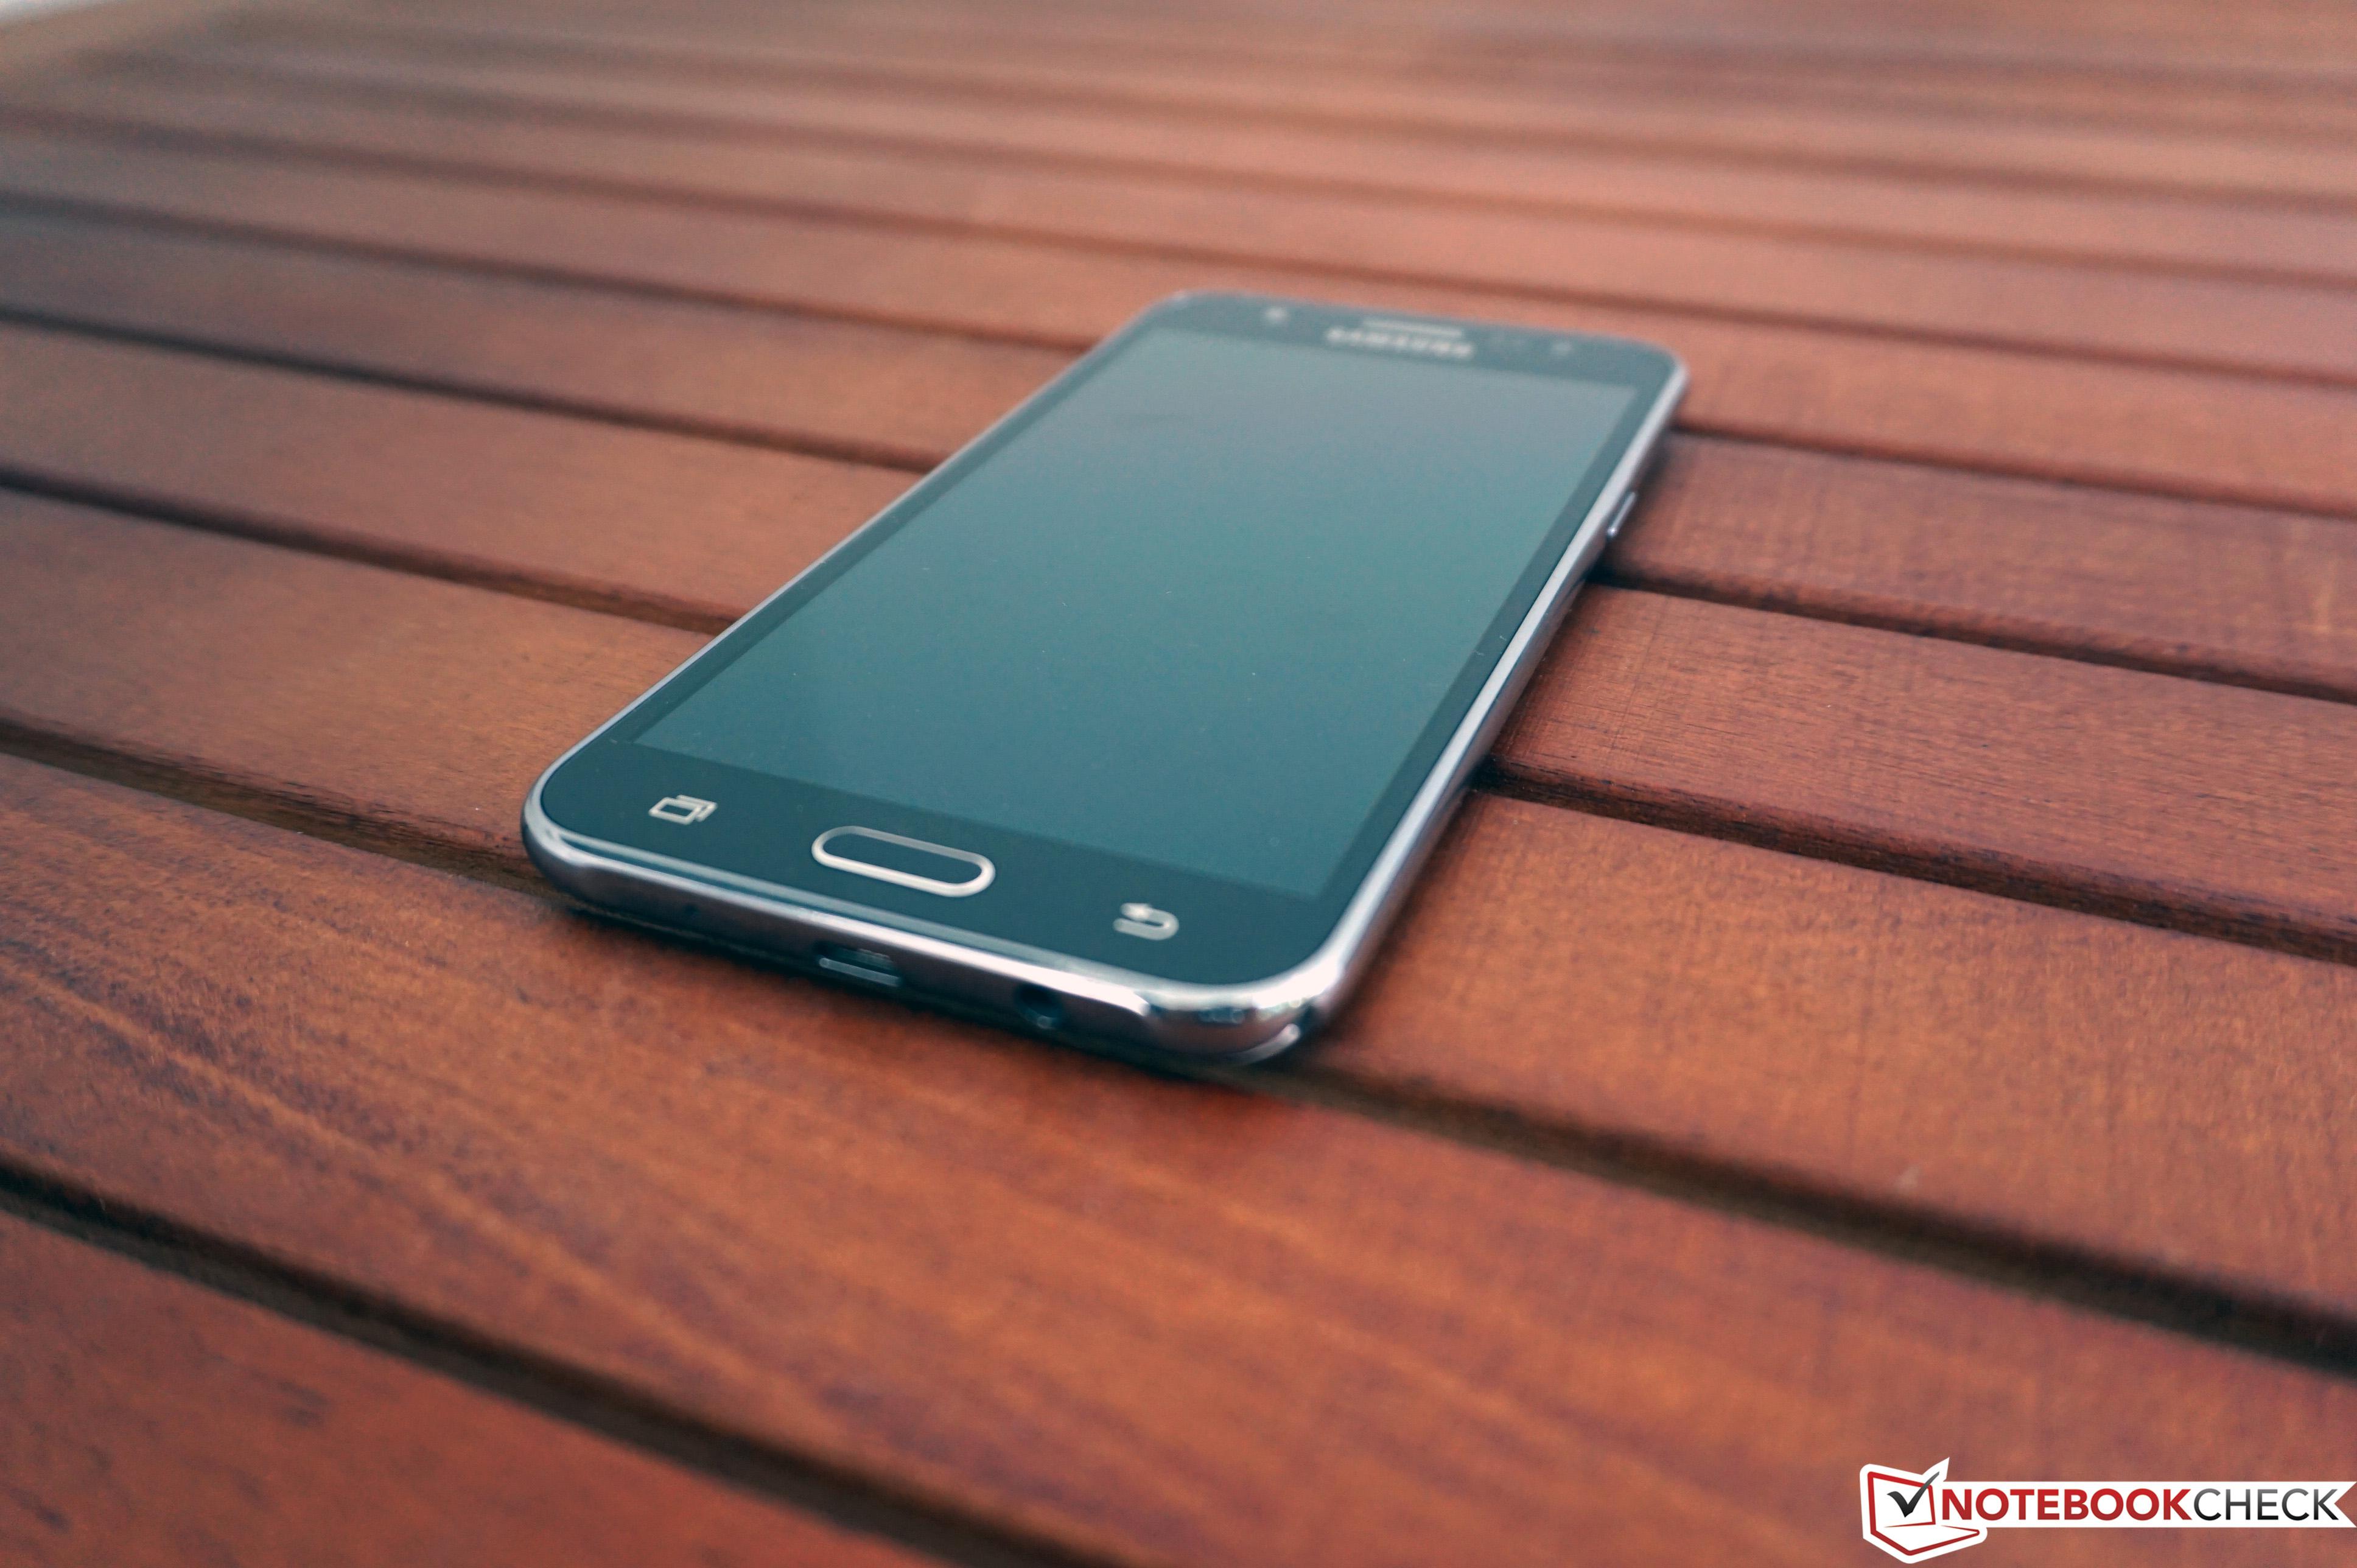 Samsung Galaxy J5 Smartphone Review